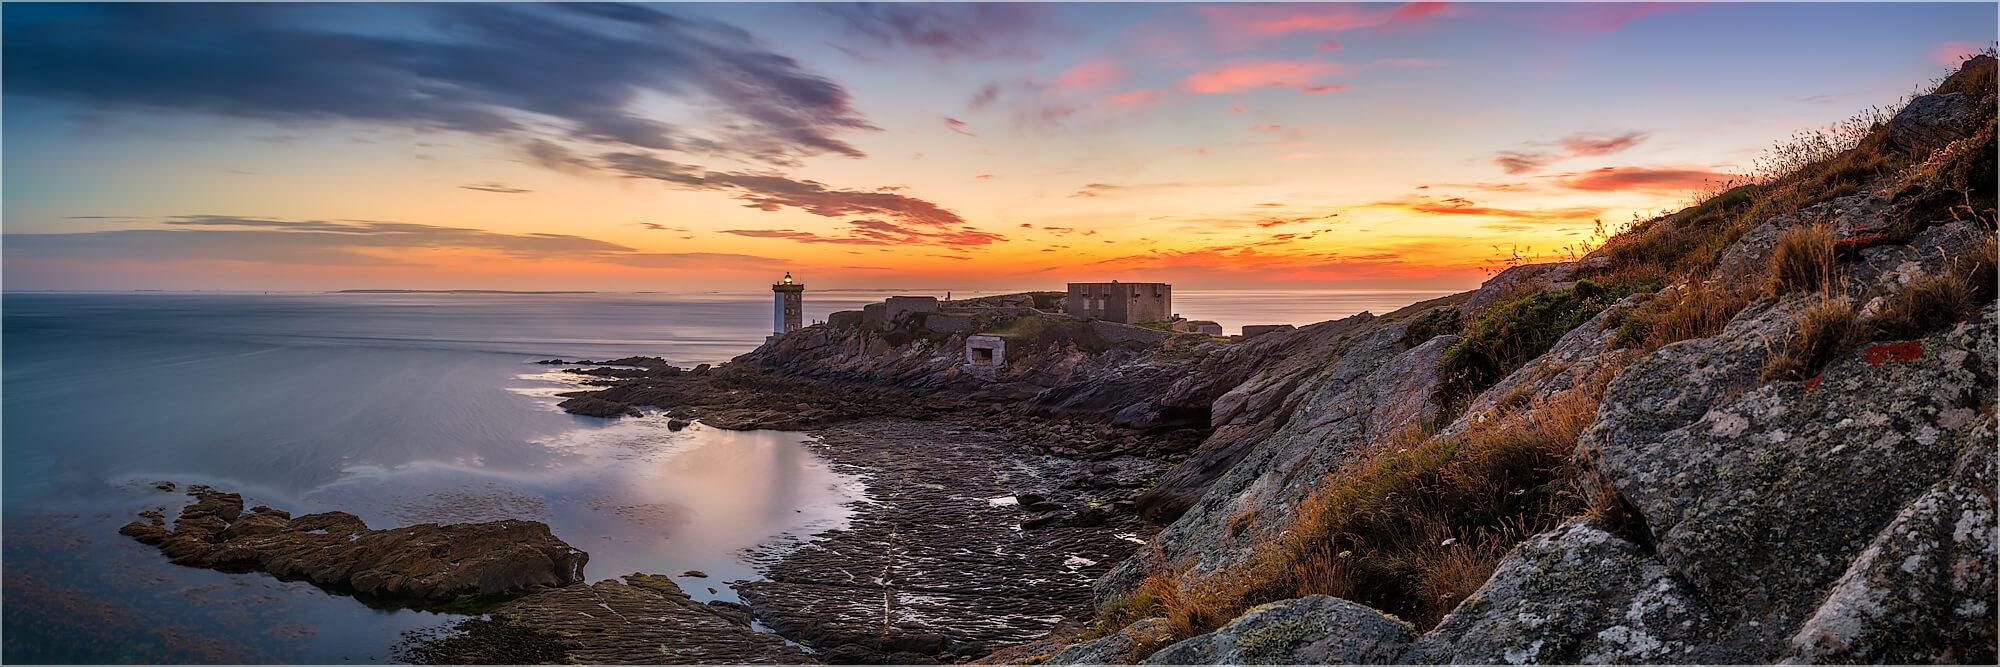 Panoramafoto der Atlantiküste Bretagne Frankreich